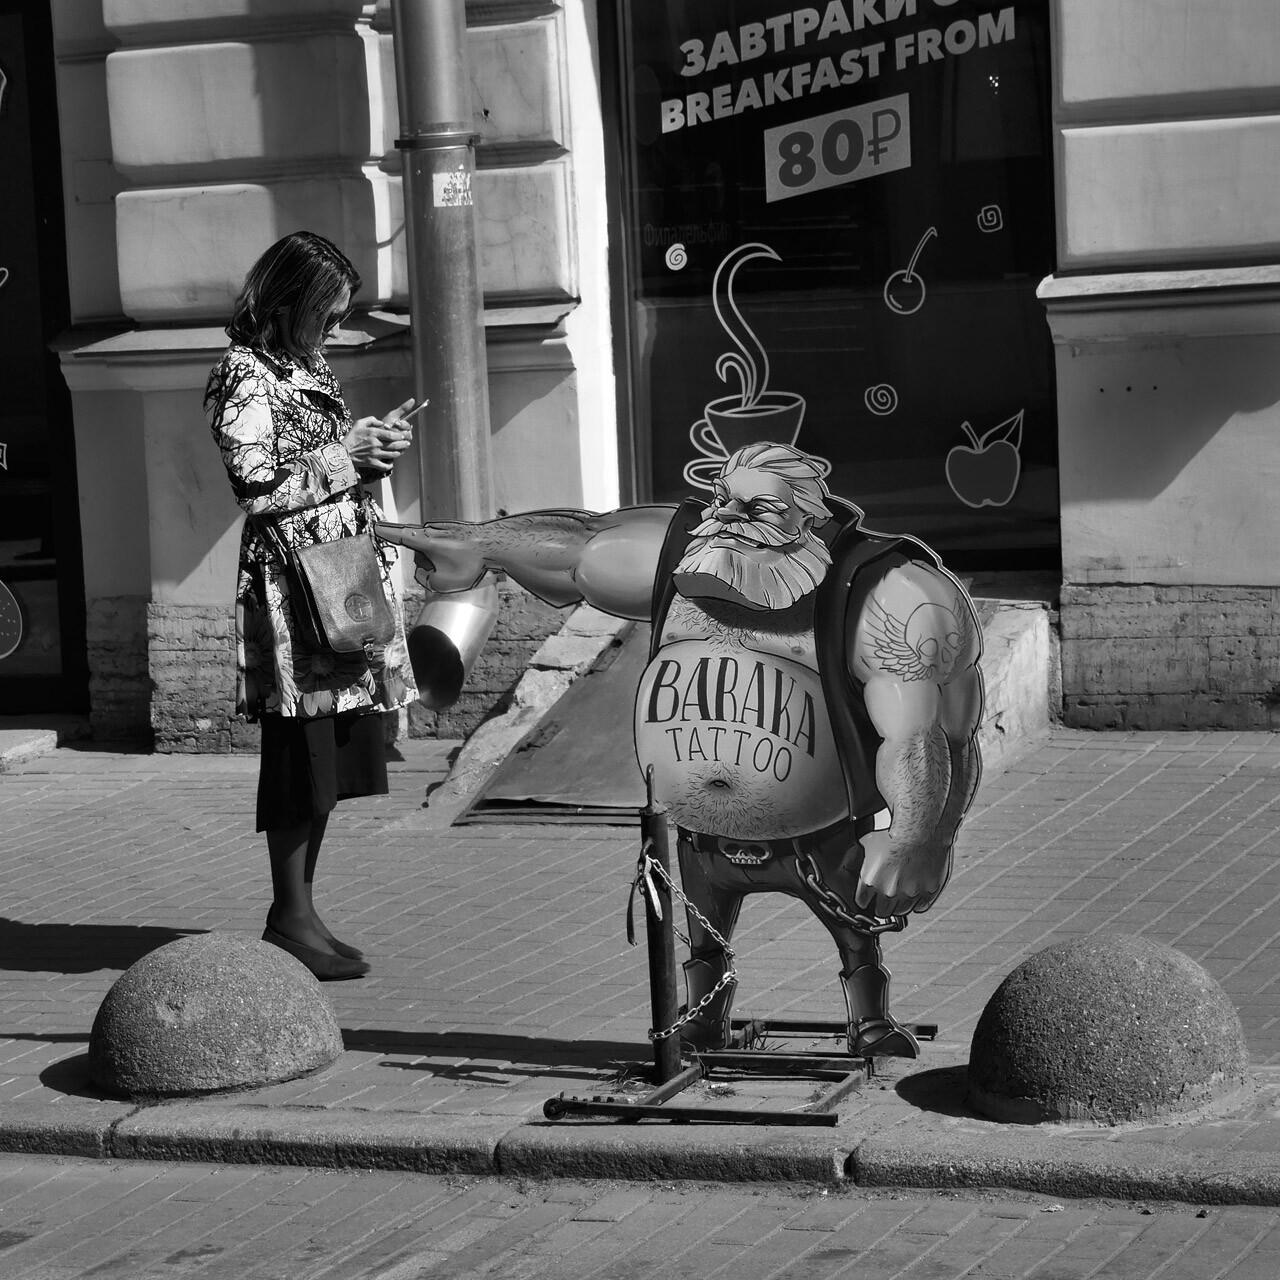 Санкт-Петербург, 2019. Фотограф Борис Назаренко